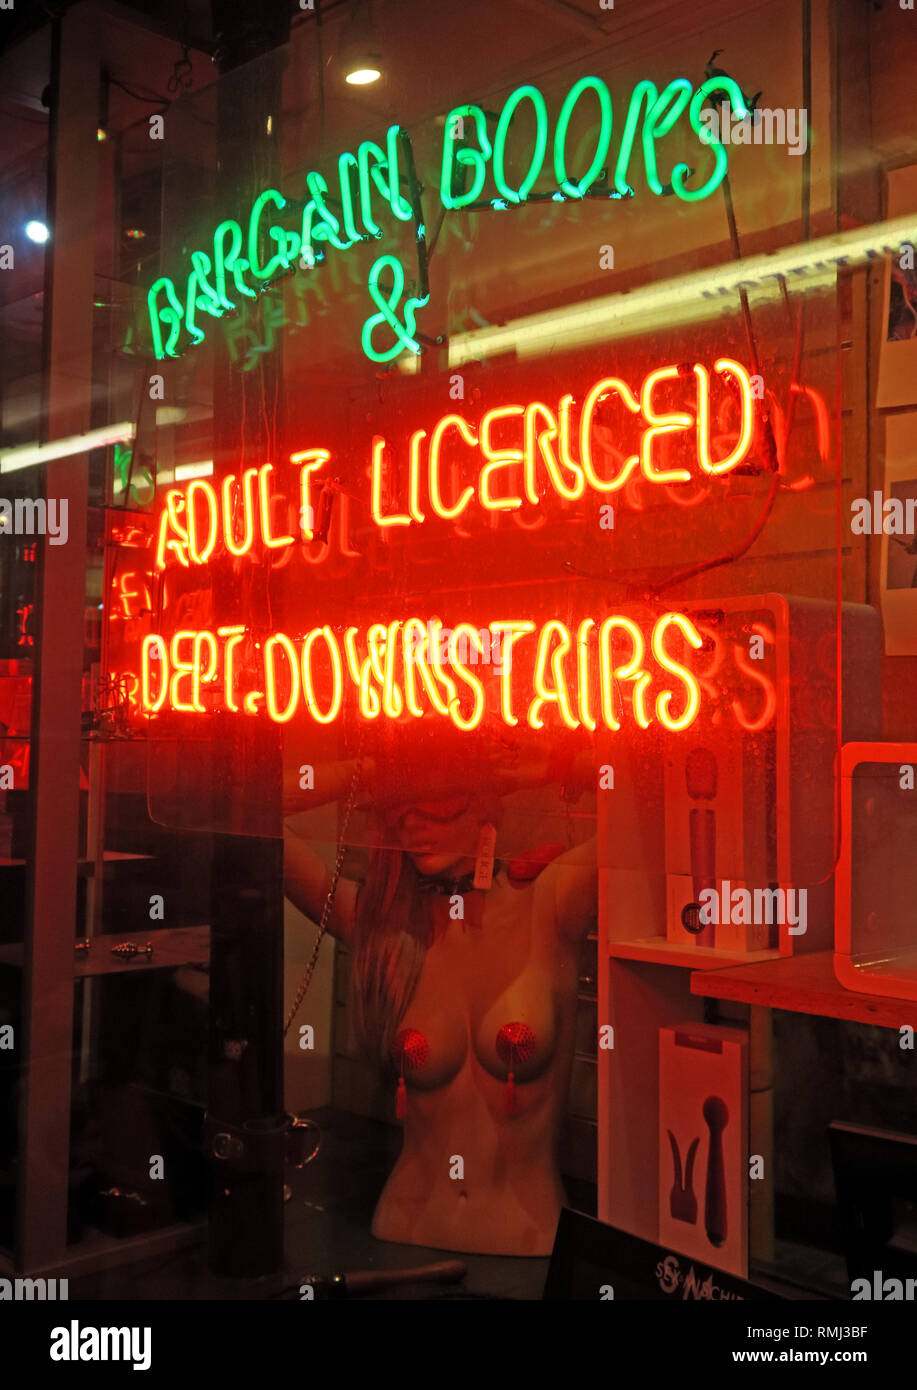 @HotpixUK,HotpixUK,GoTonySmith,England,UK,lights,night,dusk,neon lights,sign,advert,bright,lighting,SoHo,South East England,City Centre,City,tourist,tourism,travel,neon sign,evening,night time,star,music,Downstairs,Neon Sign,Soho,DVD,Books,Adult,XXX,dirty,city centre,licensed sex shop,licensed,adult,downstairs